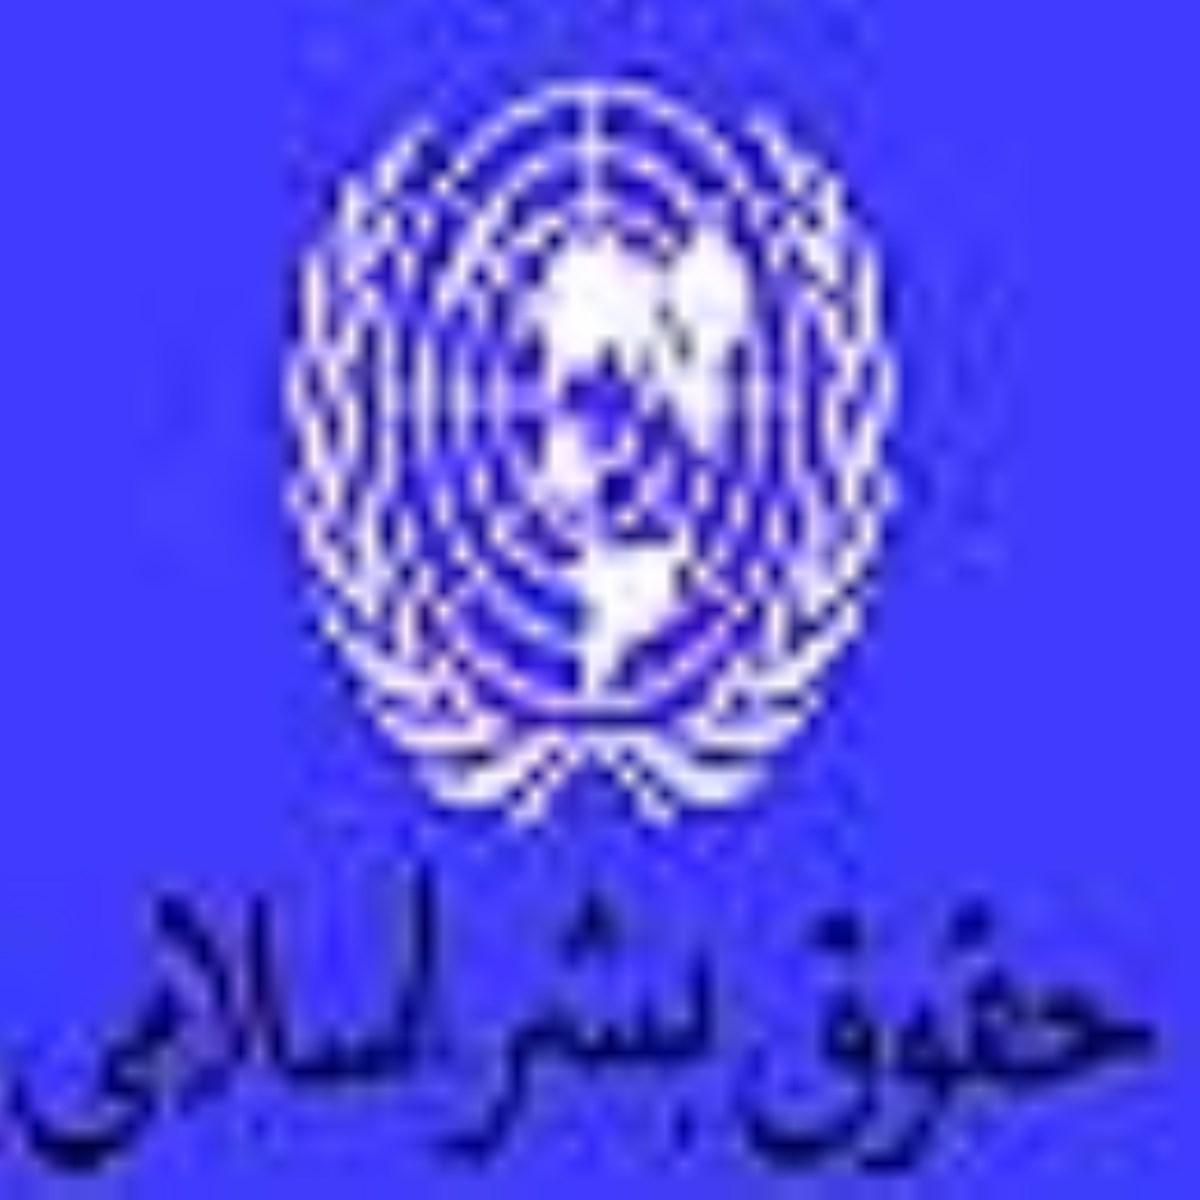 متن اعلاميه حقوق بشر اسلامي